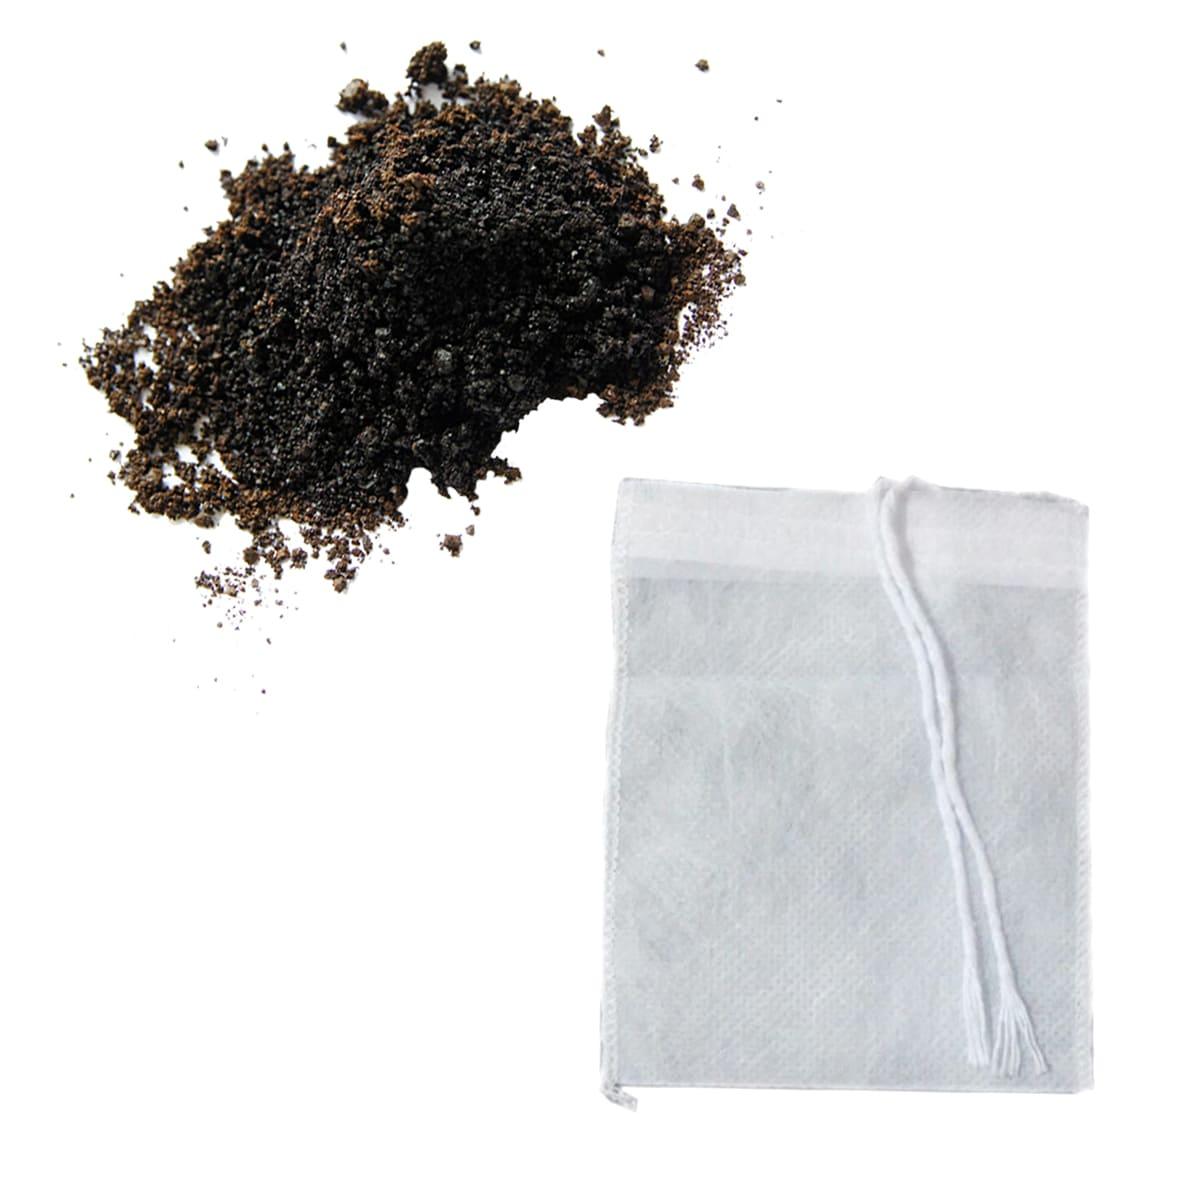 Rowa Phos Removedor Fosfato E Silicato 100g A Granel + Bag